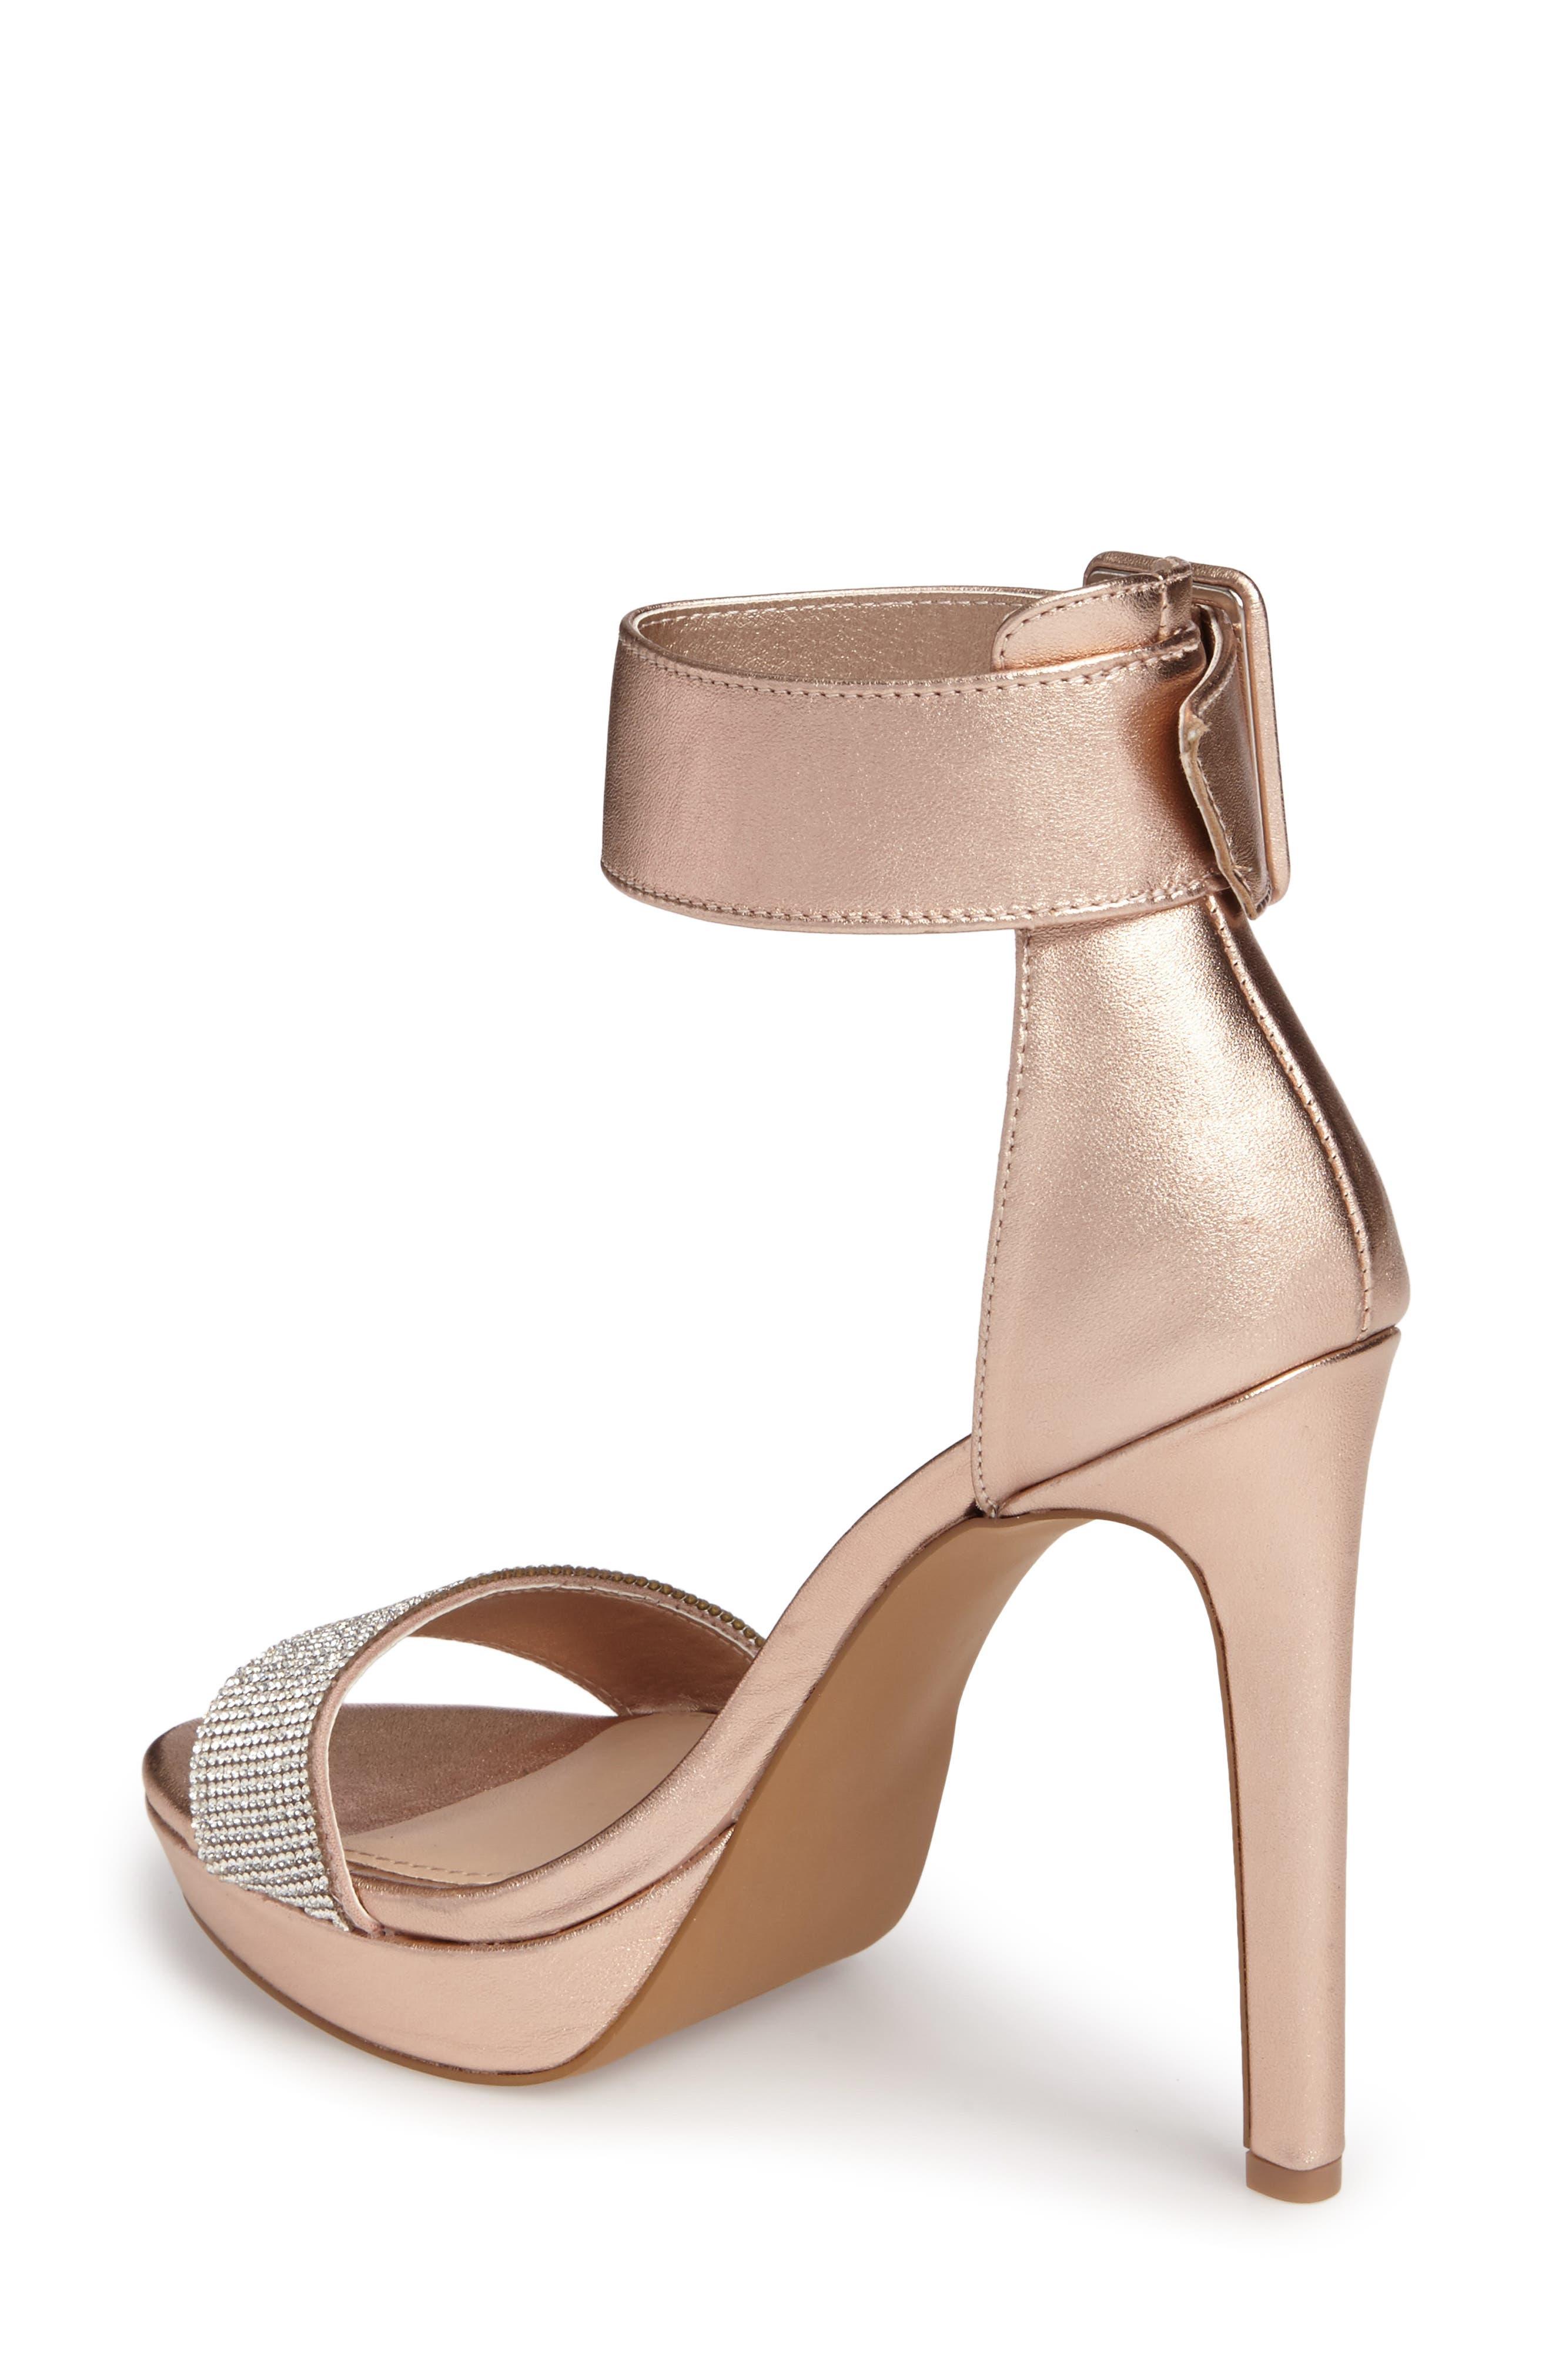 Circuit Sandal,                             Alternate thumbnail 2, color,                             Rose Gold Leather